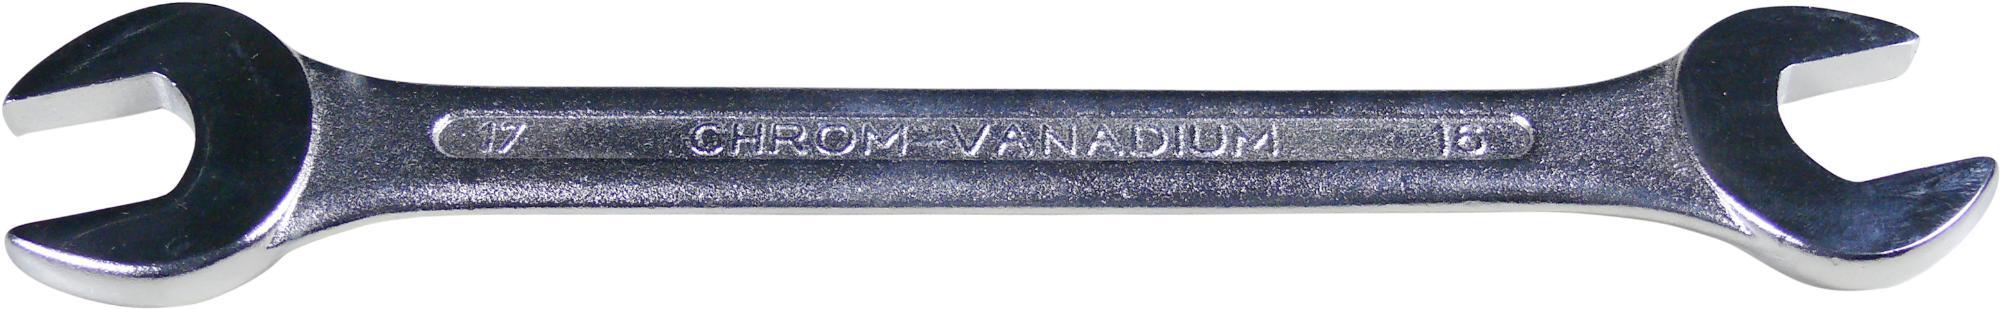 Kľúč vidlica-vidlica, 10x11 mm